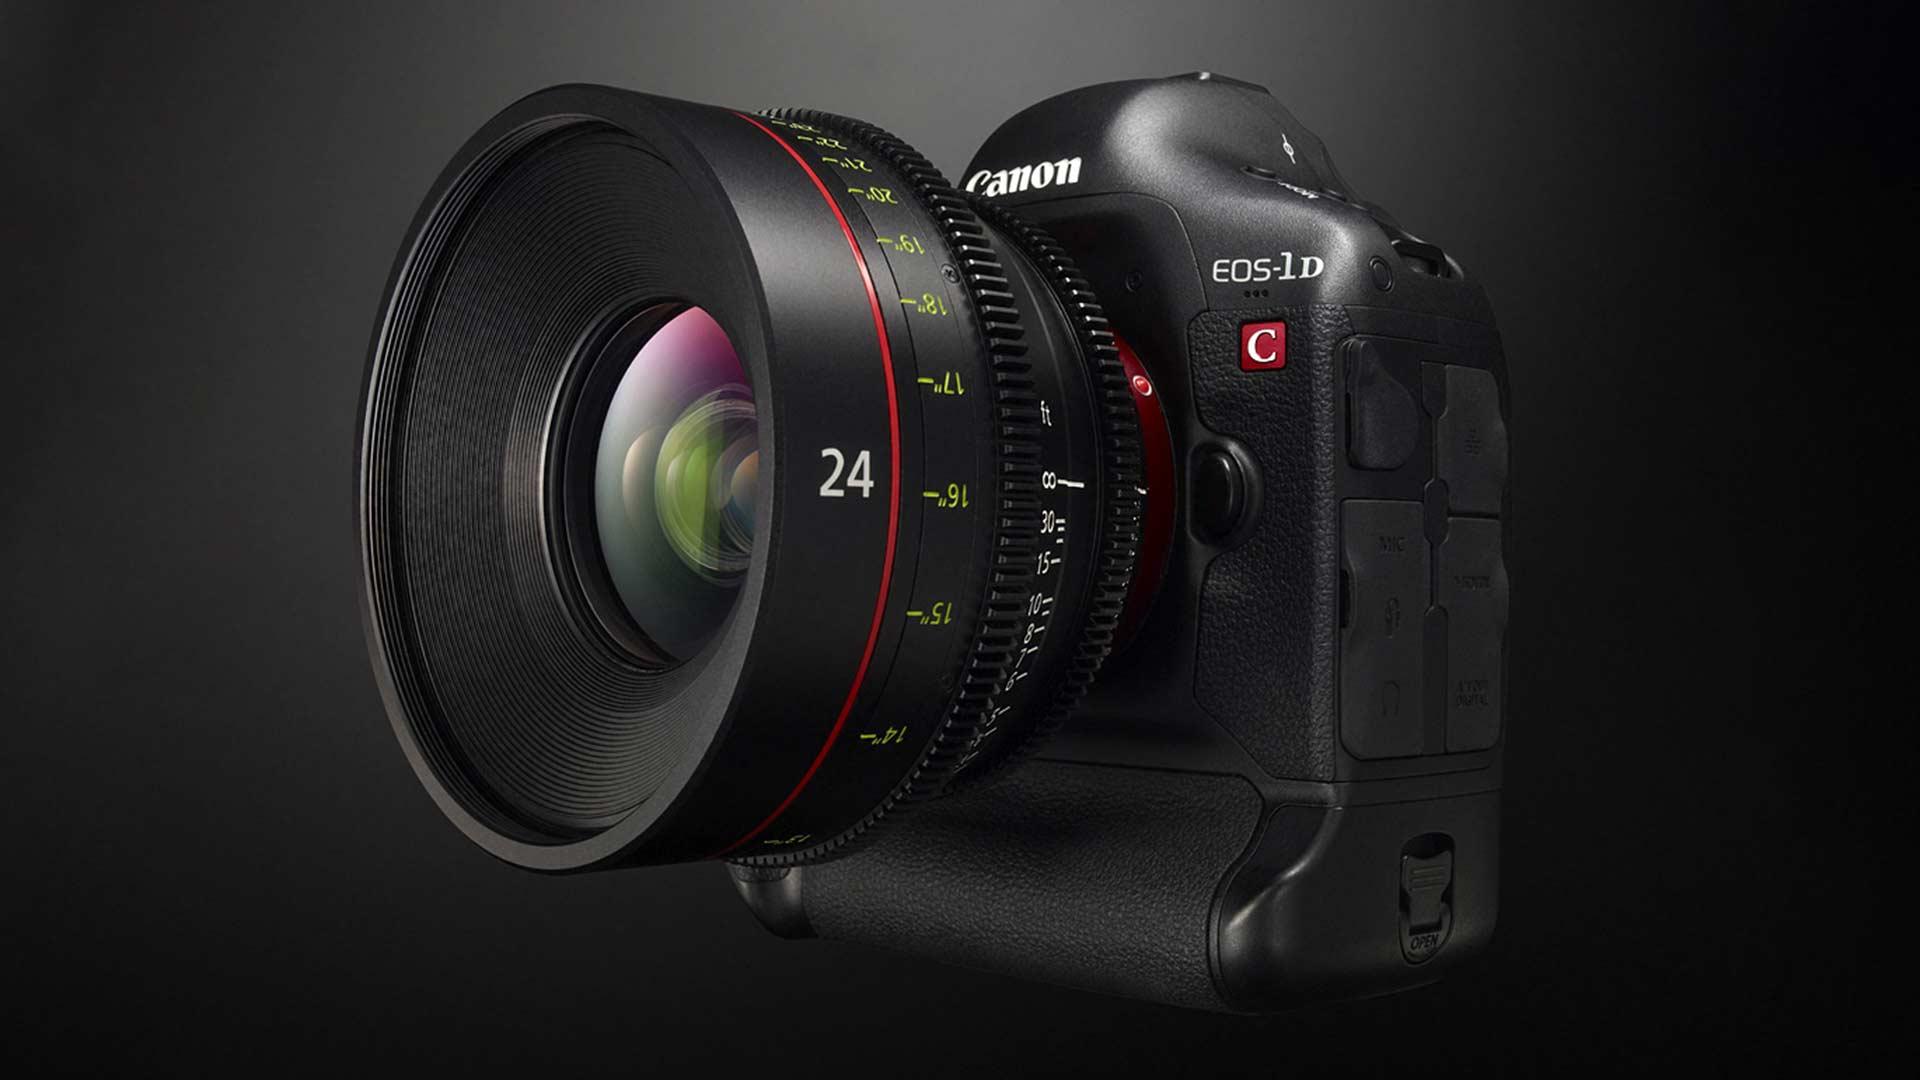 The Canon EOS 1D C. Image: Canon.